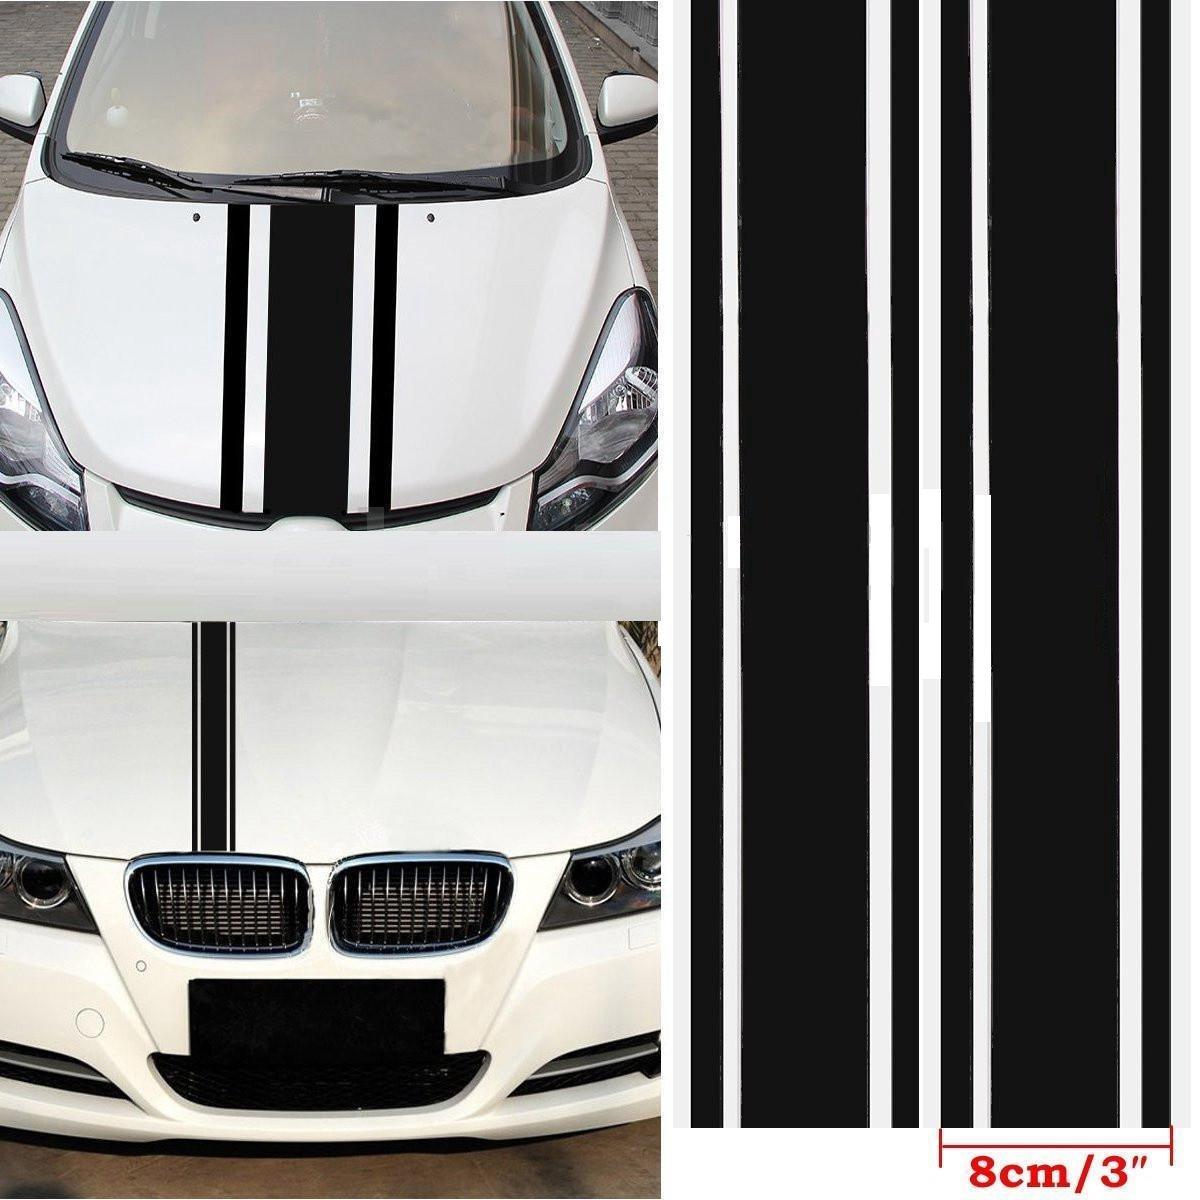 Cvanu car decal car body vinyl racing strip stickers black size 3 inch x 72 inch for maruti suzuki alto 800 amazon in car motorbike